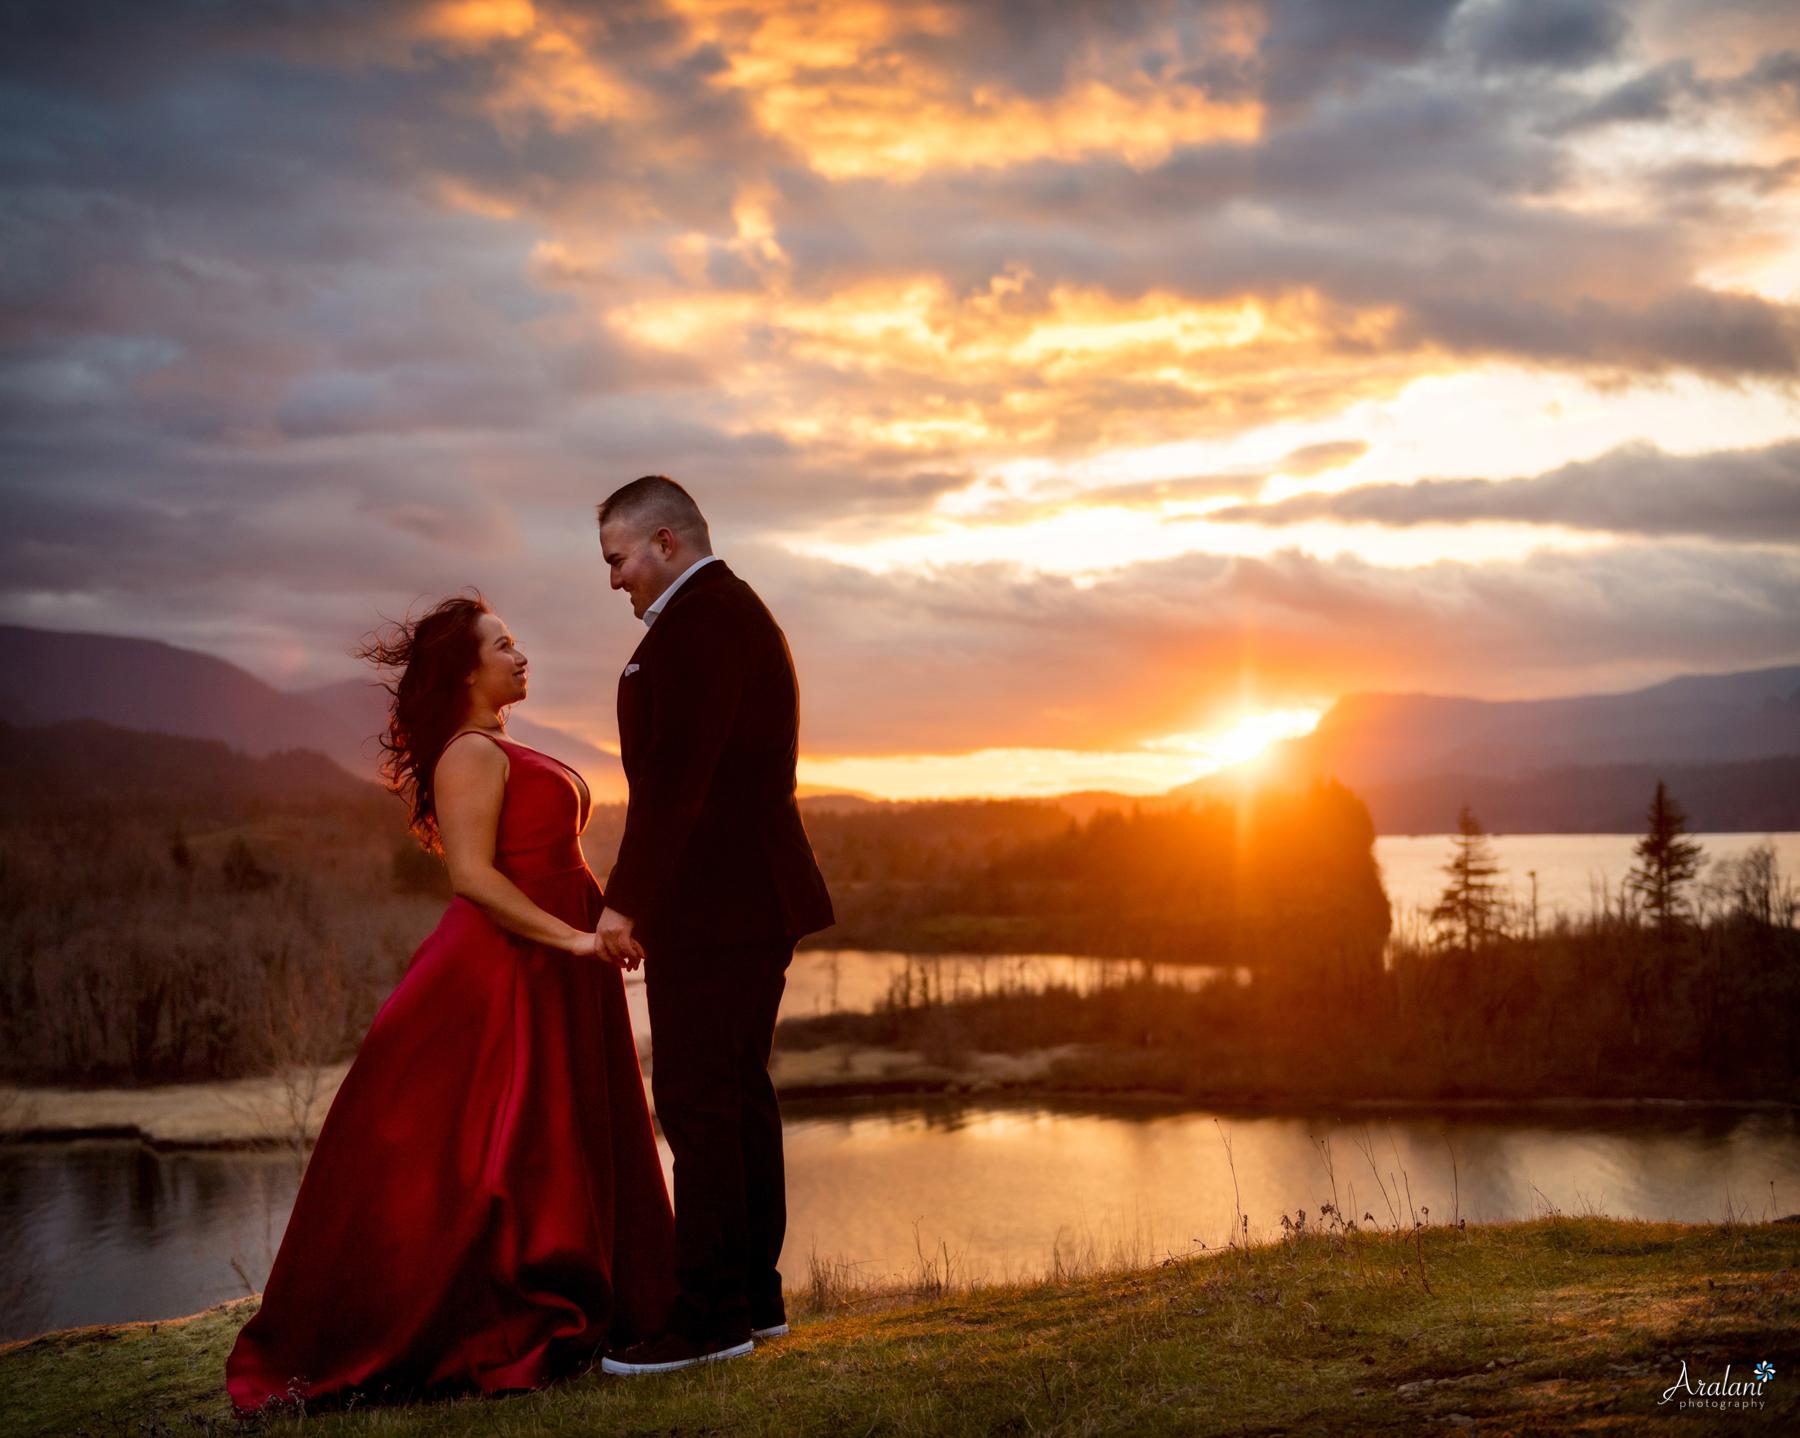 Columbia_River_Gorge_Sunset_Engagement0001.jpg